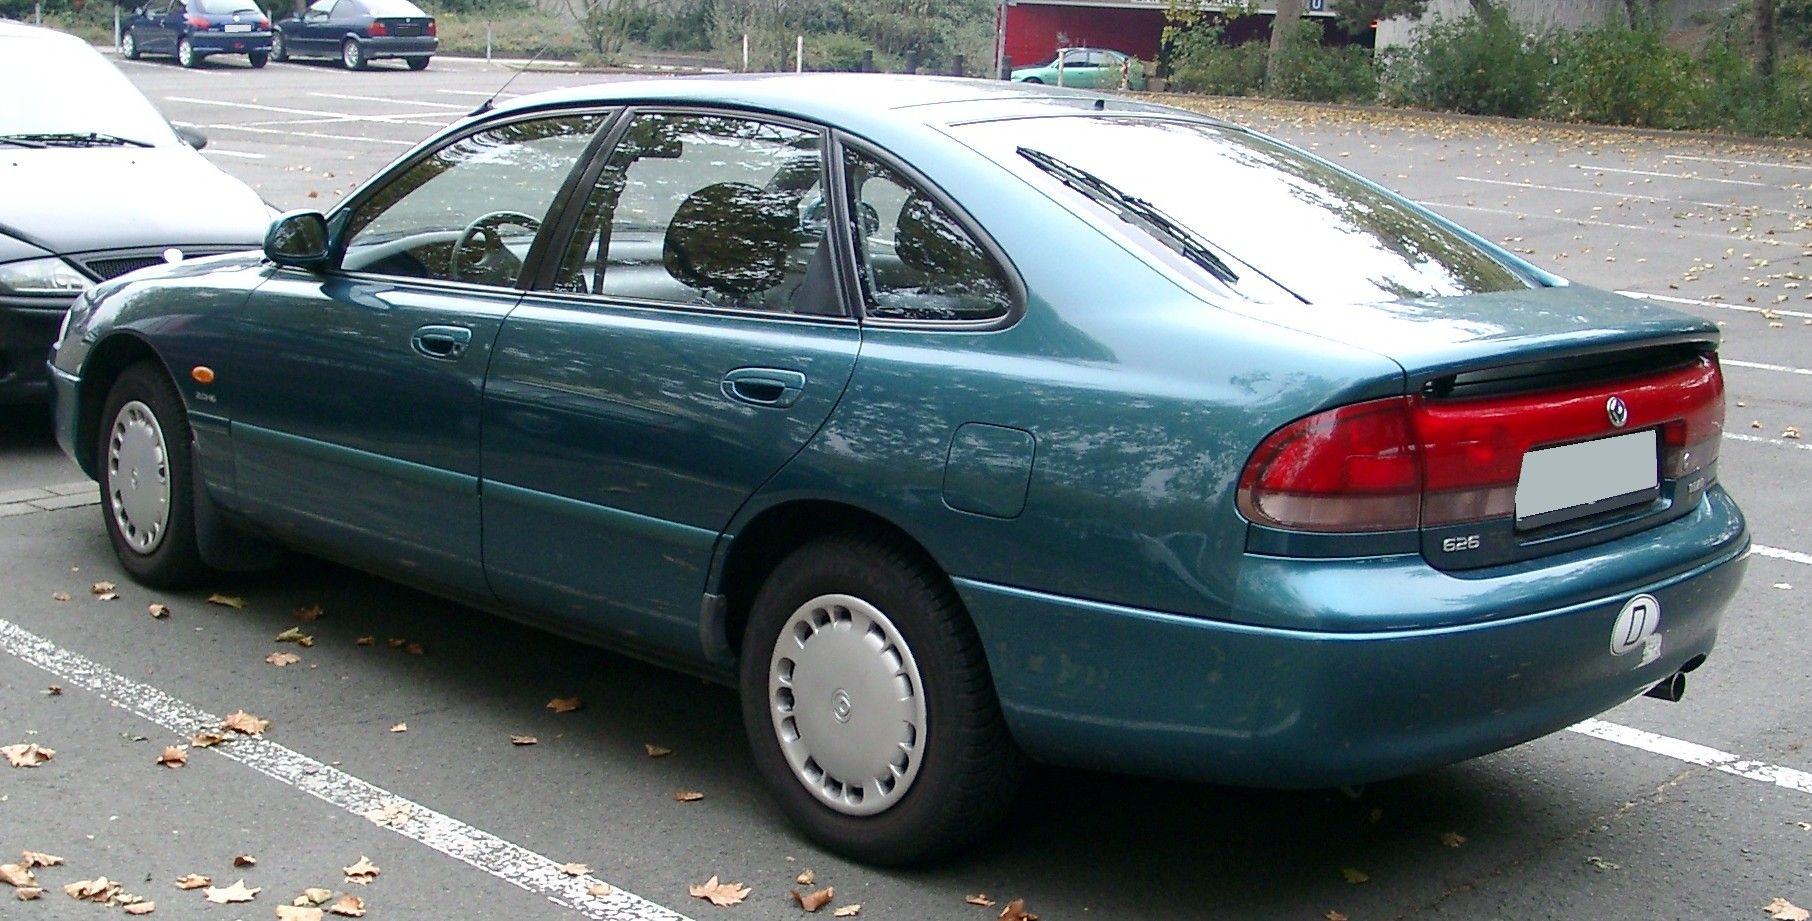 History of the Mazda Cappella model